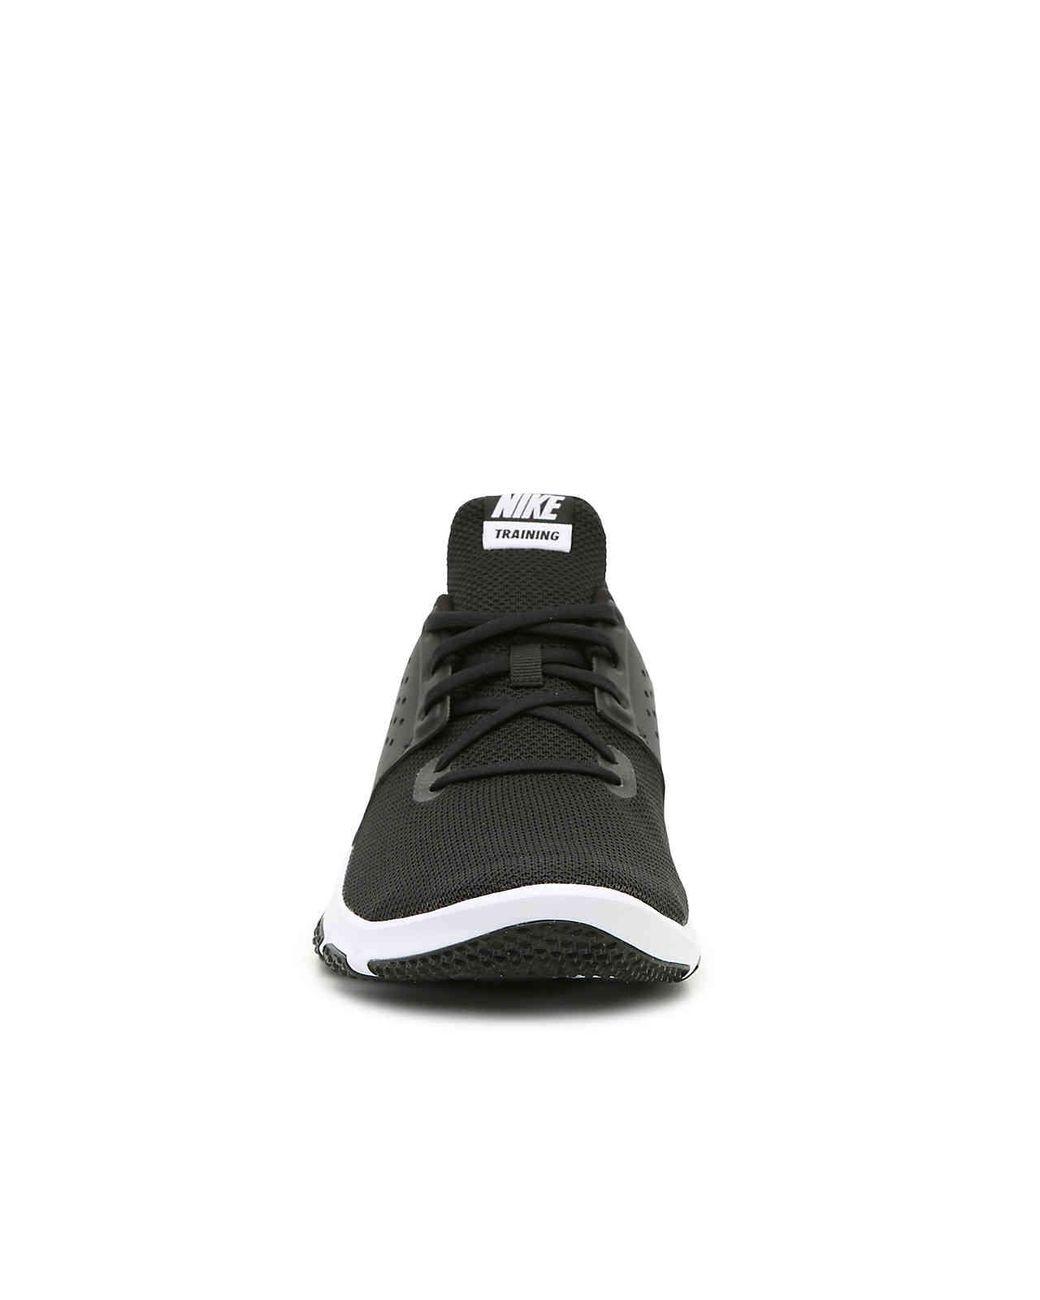 a3743c33e9488 Lyst - Nike Flex Control Tr 3 4e Training Shoe in Black for Men